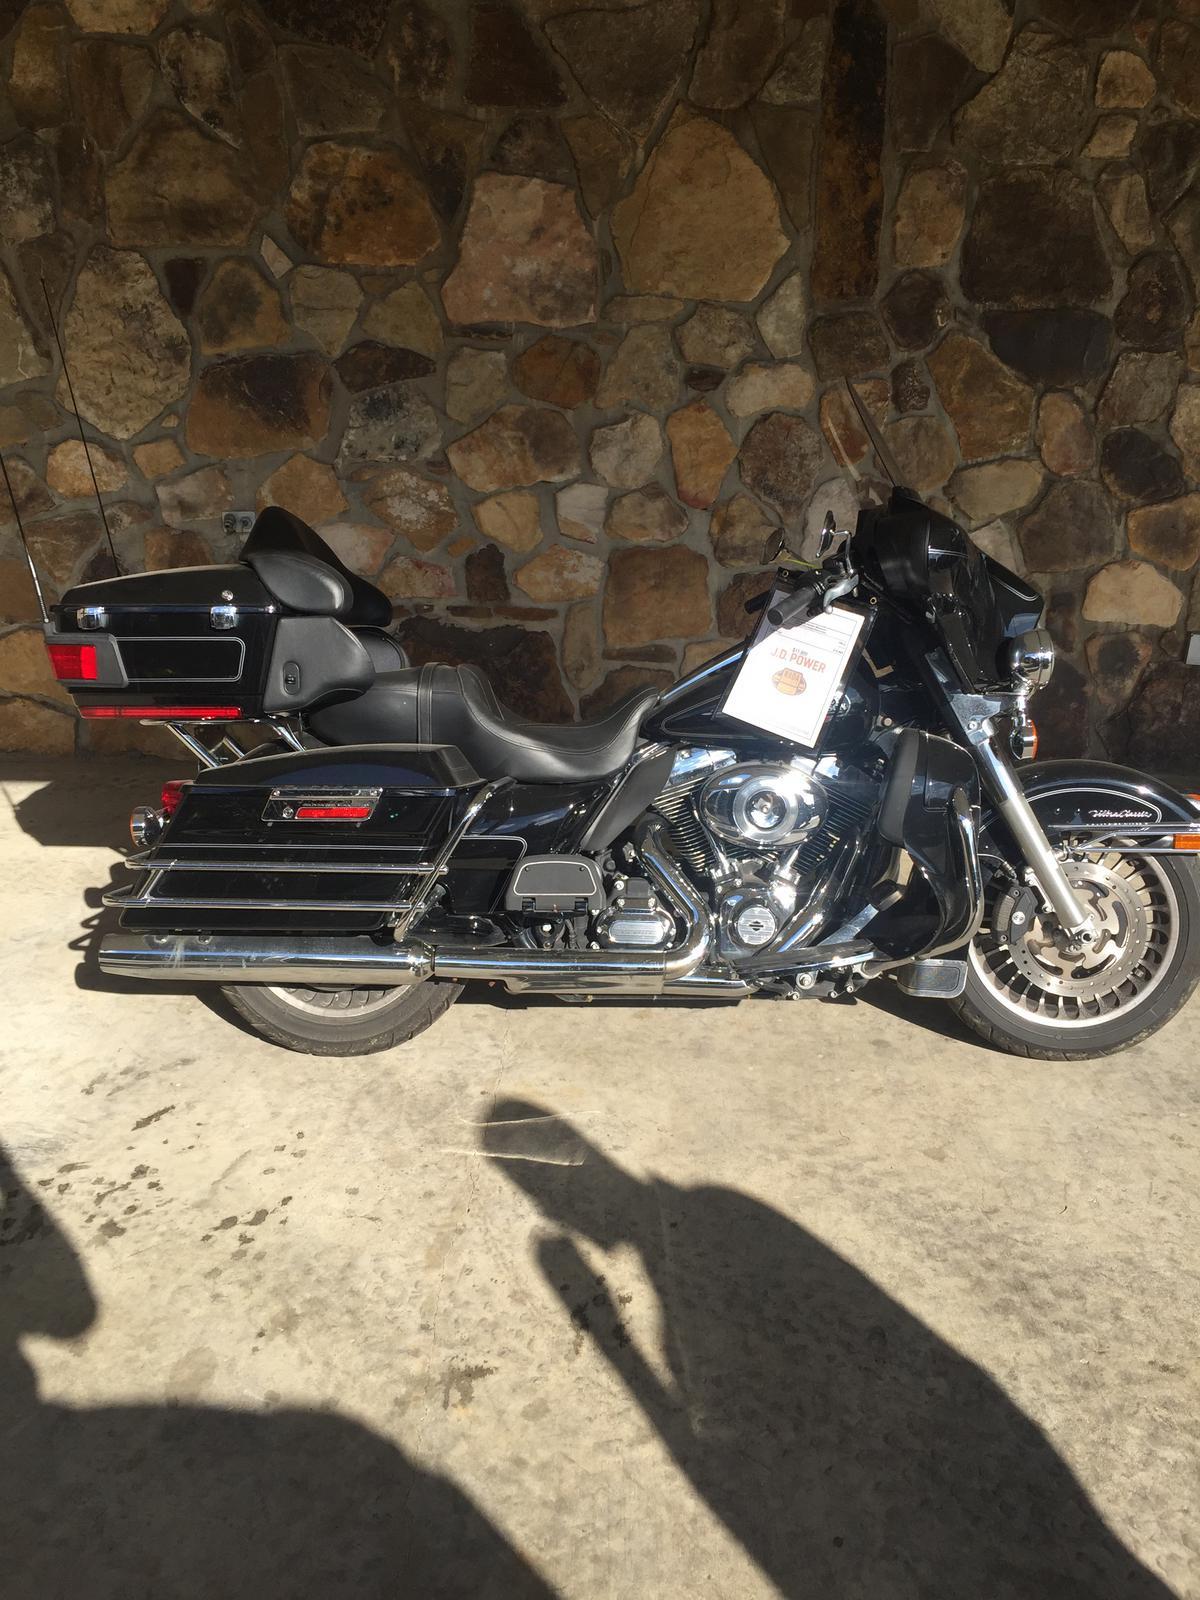 2013 Harley-Davidson® Electra Glide Ultra Classic